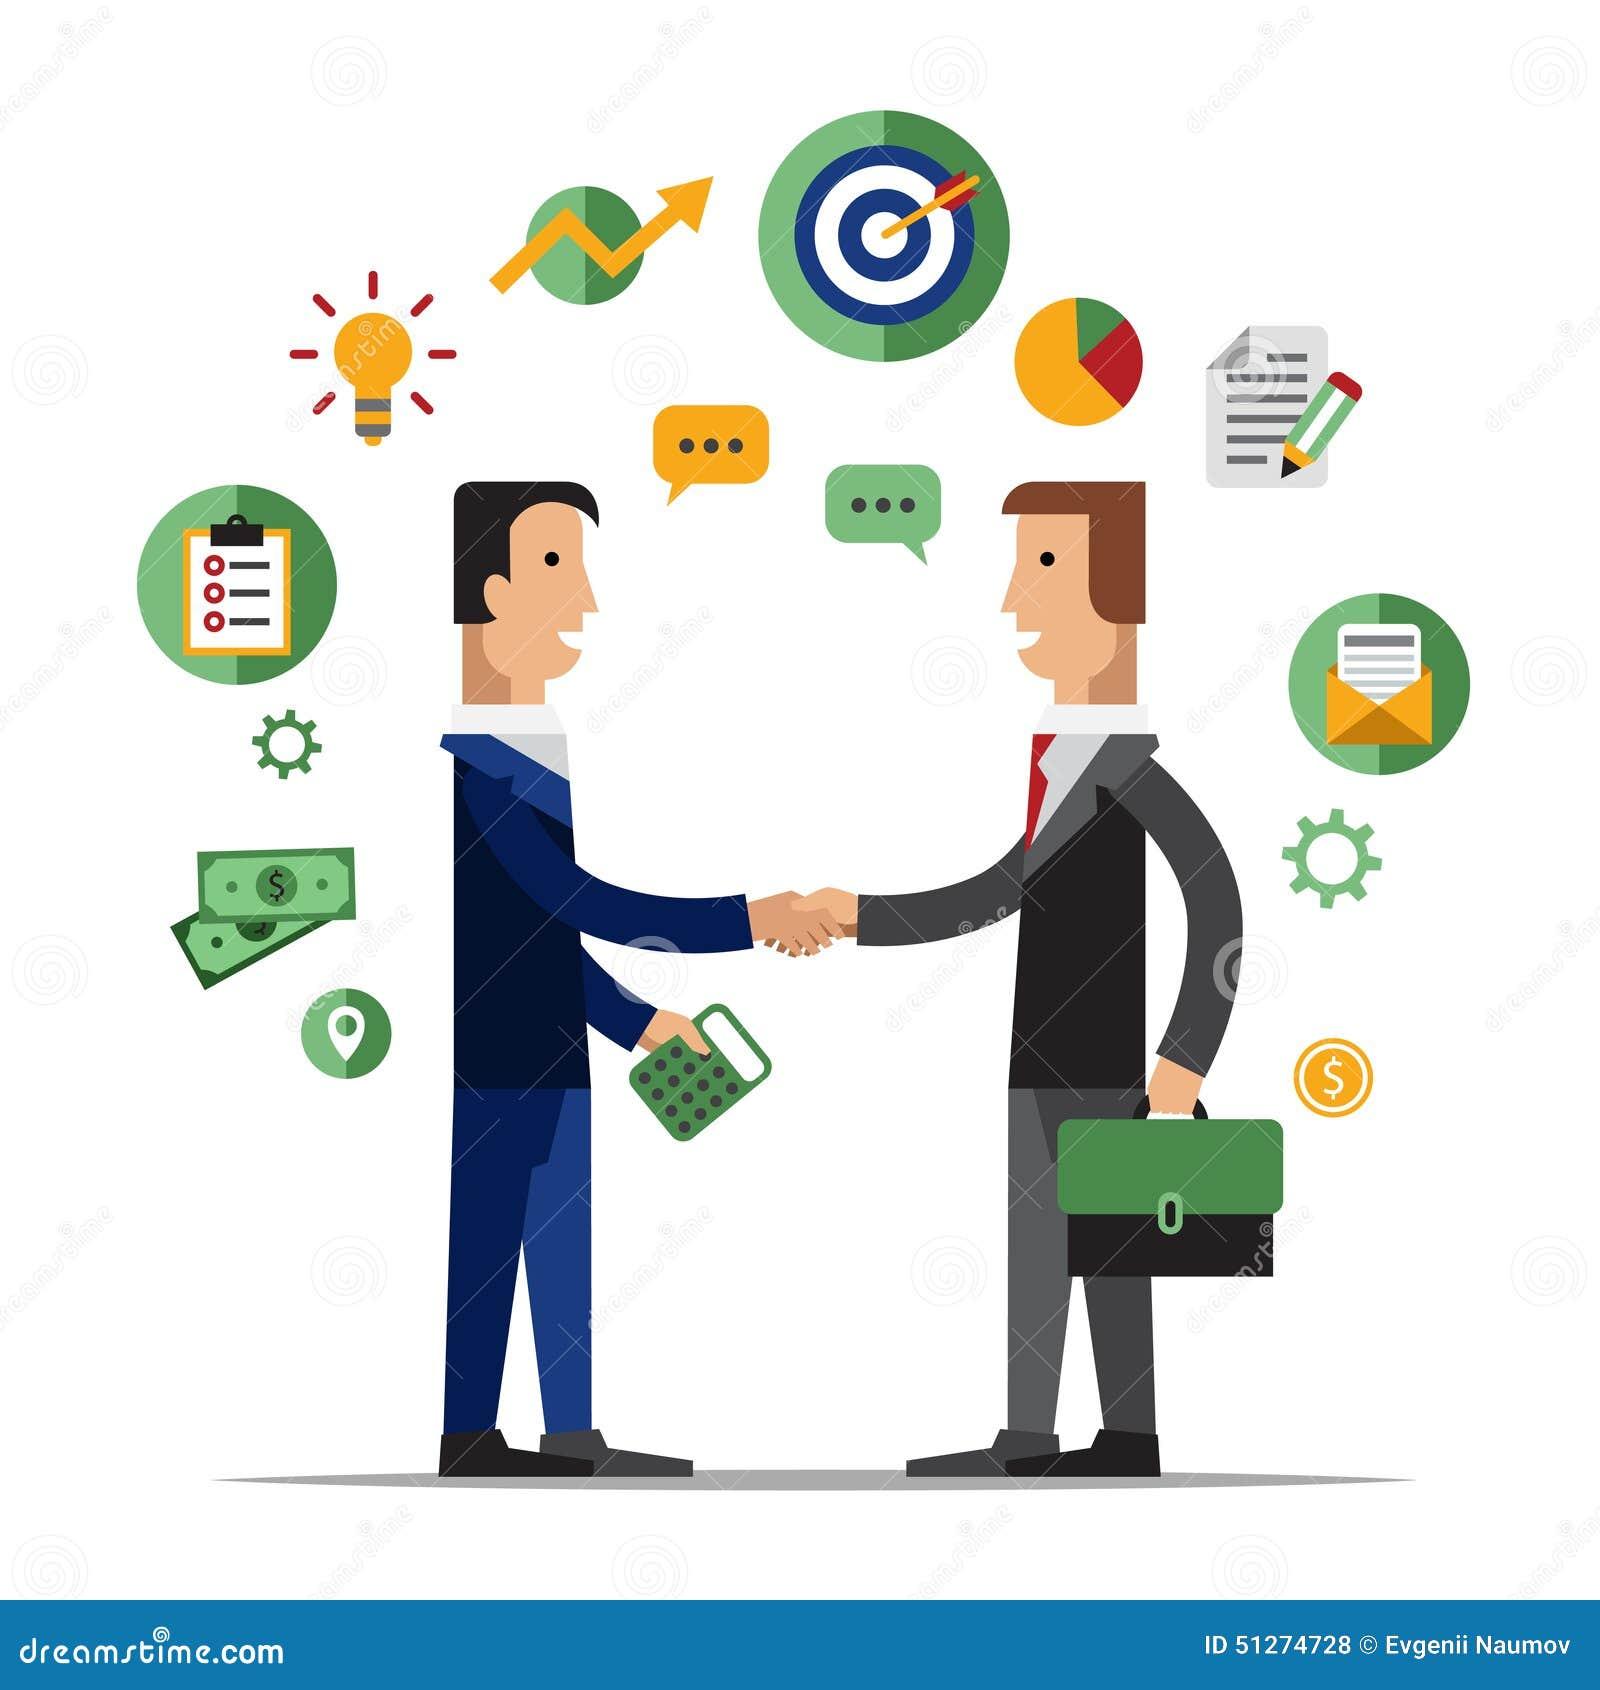 how to make a partnership business